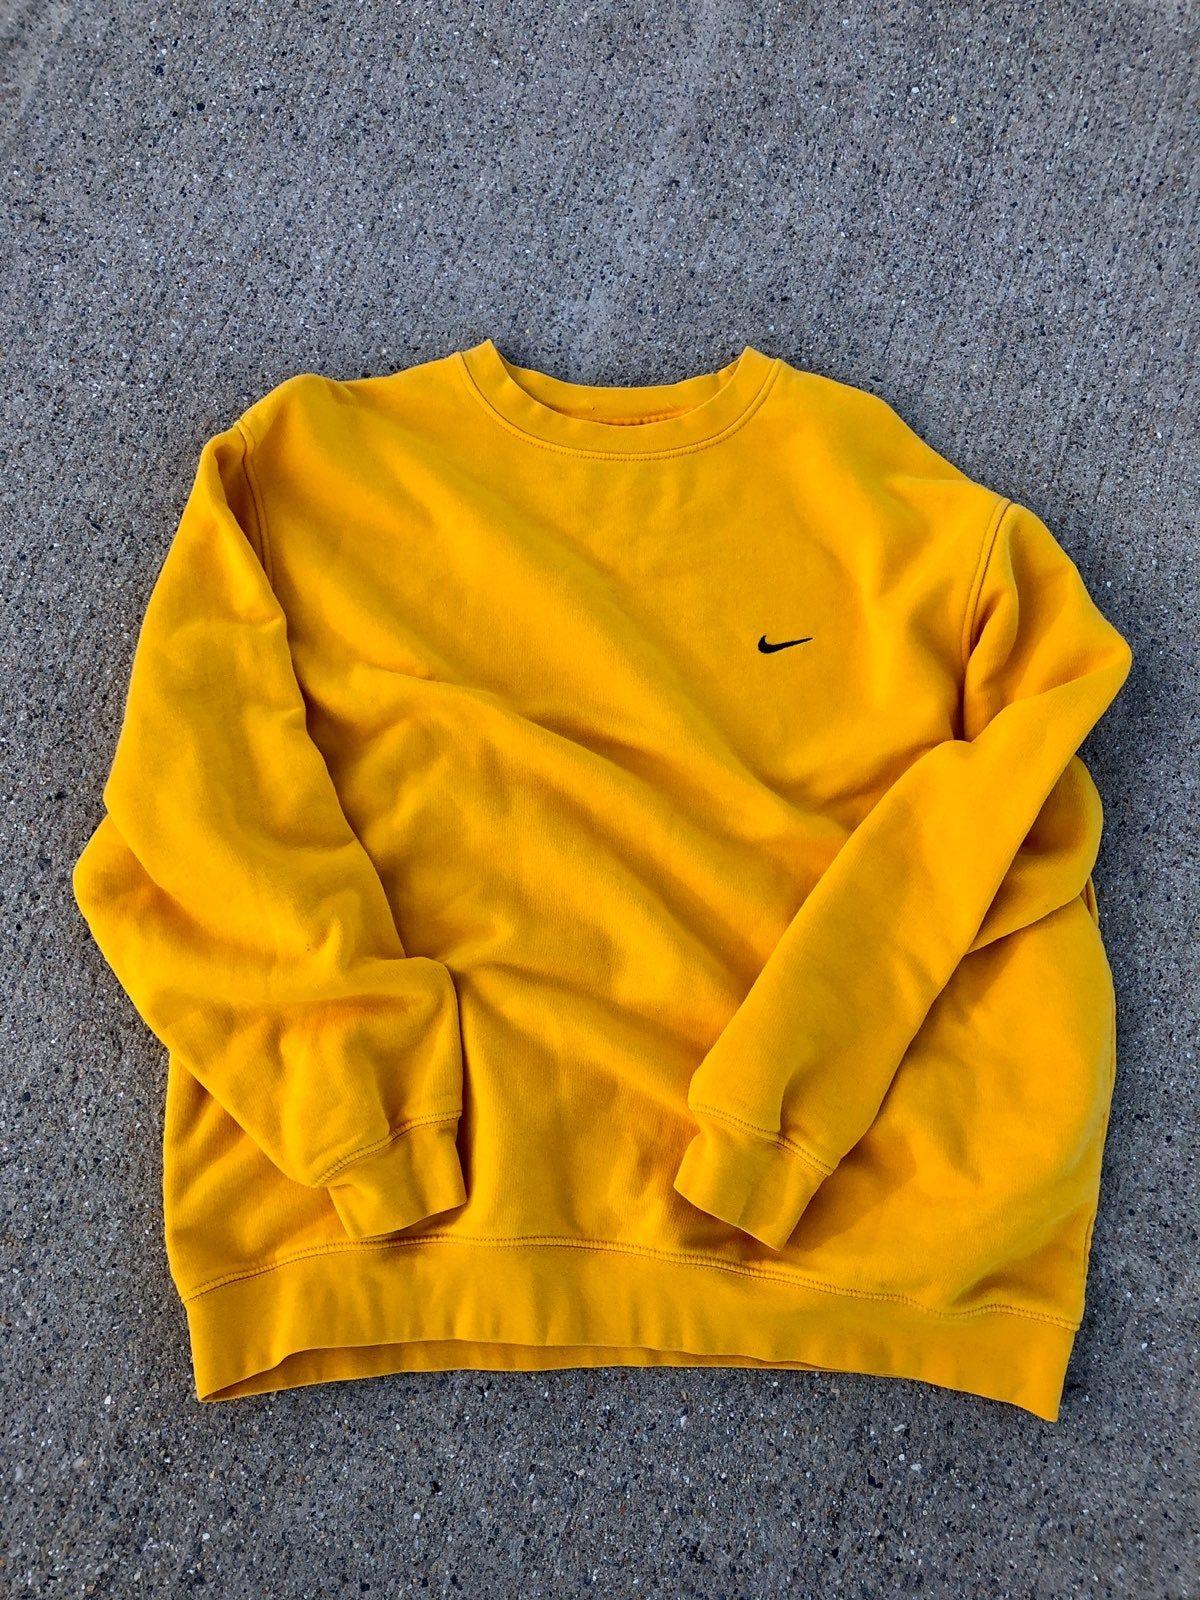 Nike Swoosh Crewneck In 2021 Sweatshirt Outfit Winter Sweatshirts Yellow Sweatshirt Outfit [ 1600 x 1200 Pixel ]